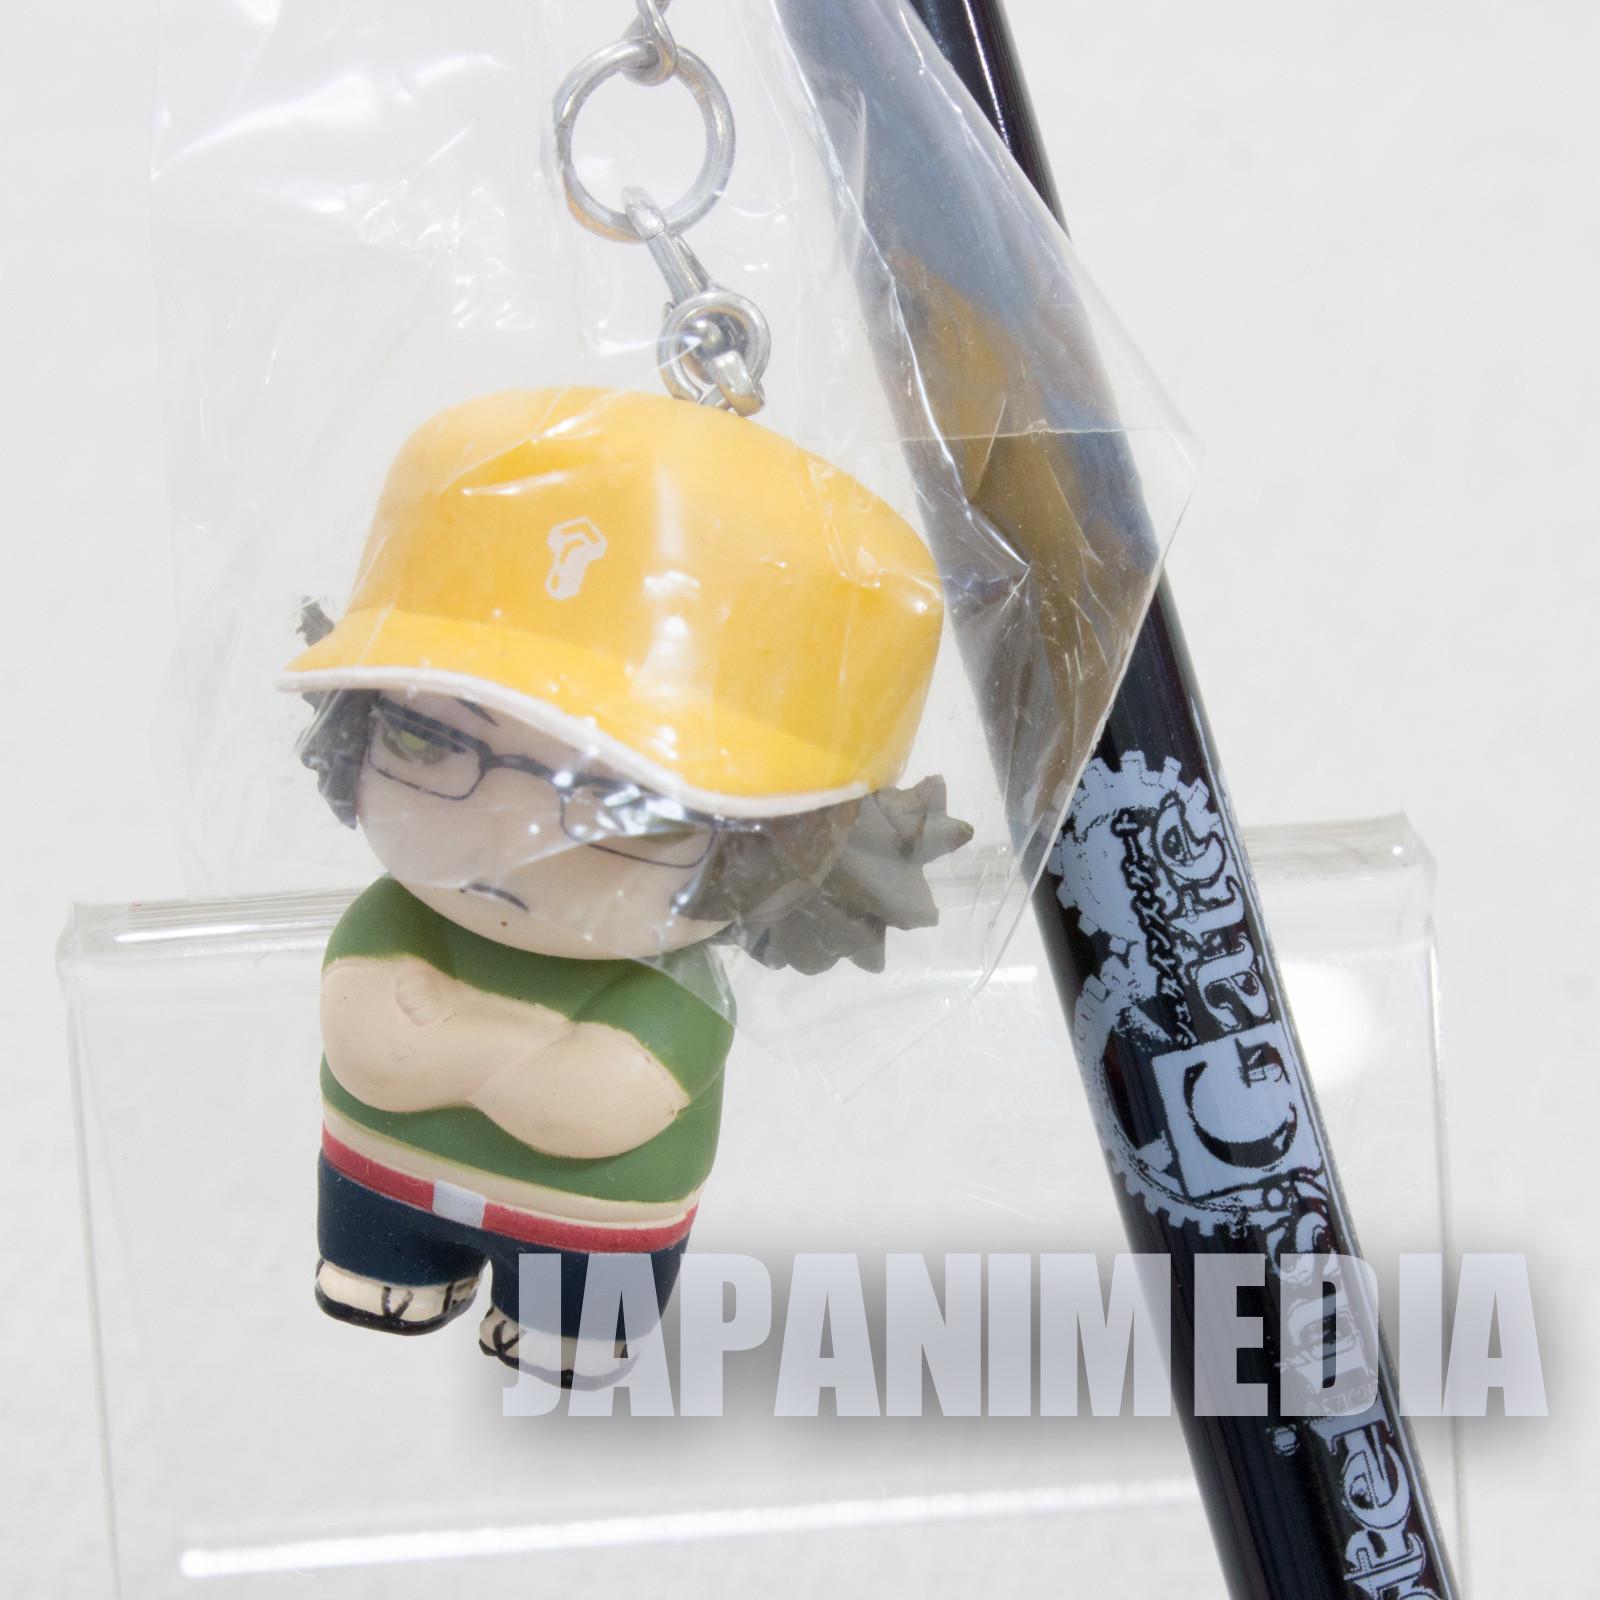 Steins ; Gate Daru Itaru Hashida Normal Ver. Mini Figure Ball Point Pen JAPAN ANIME